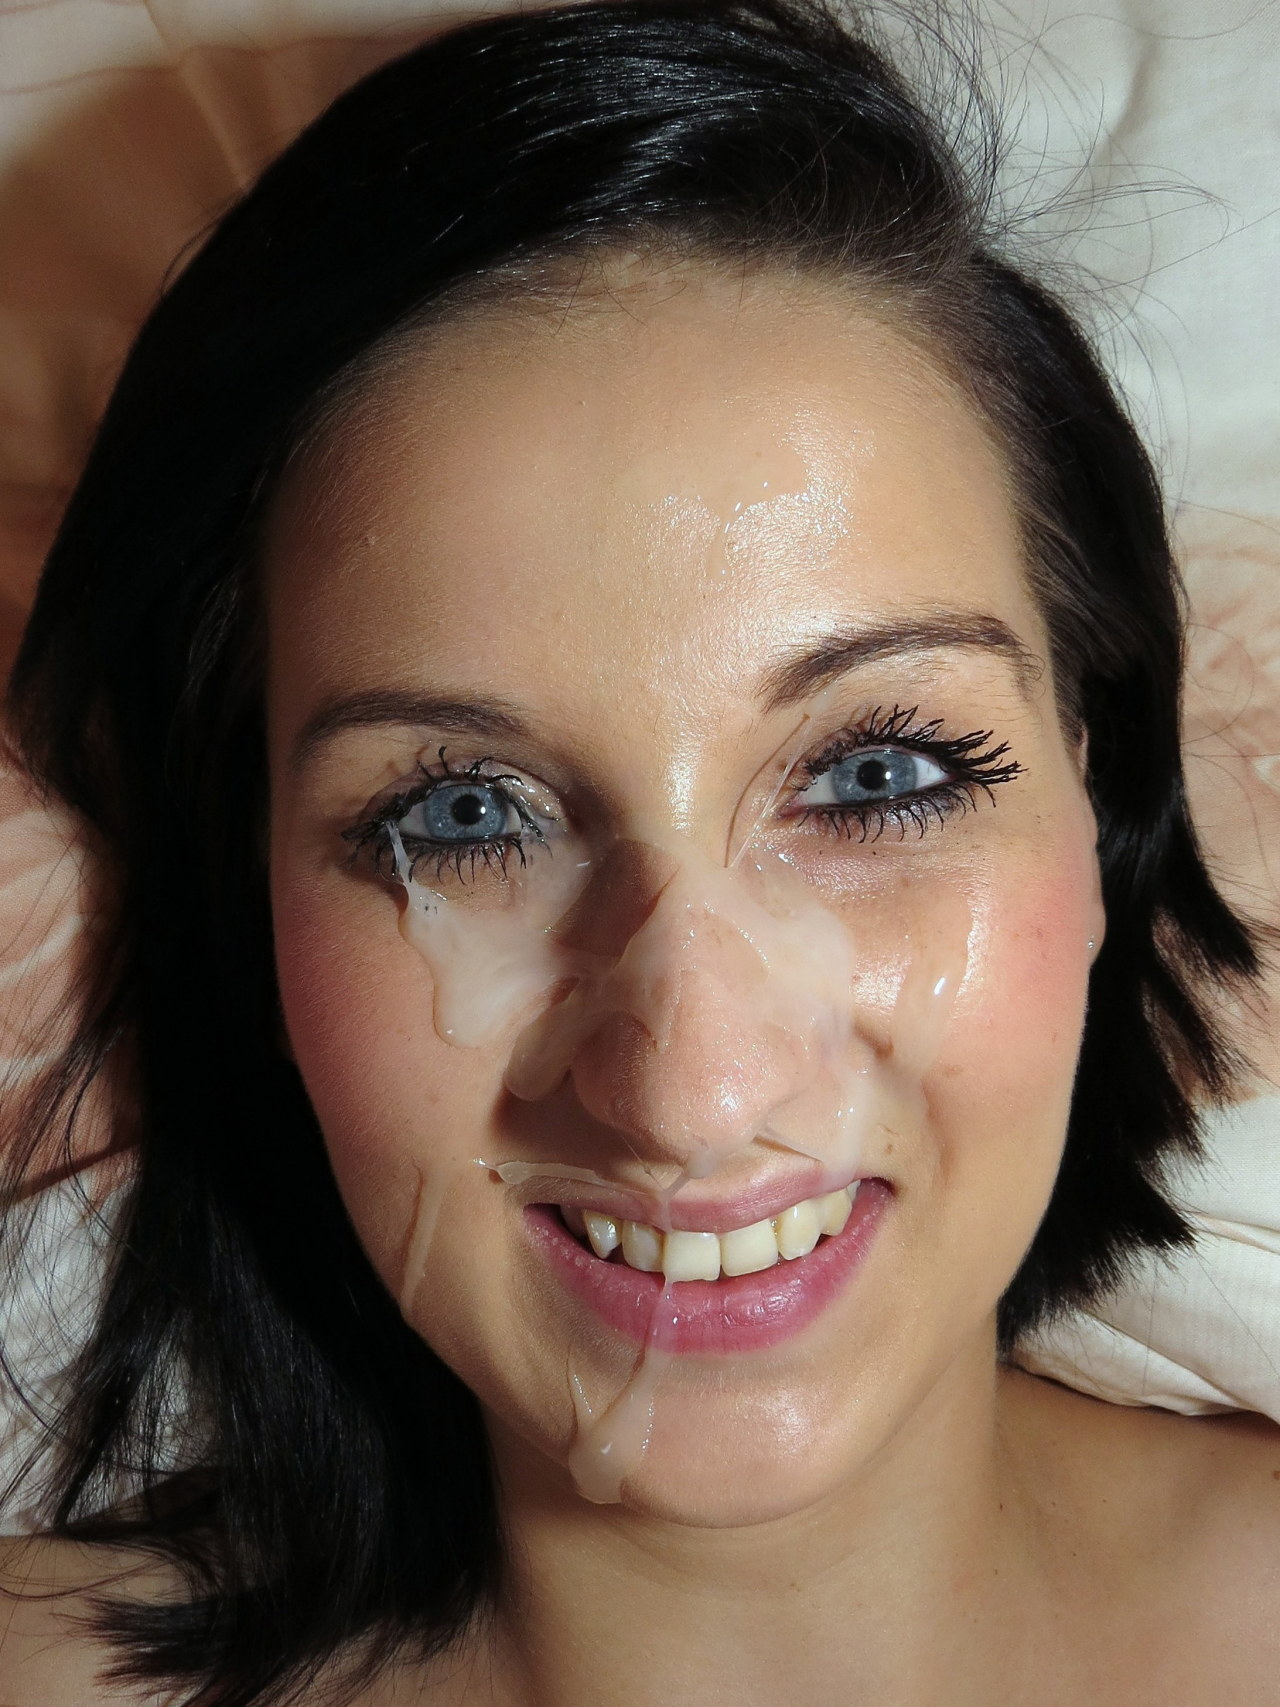 Solution satisfaction female orgasm